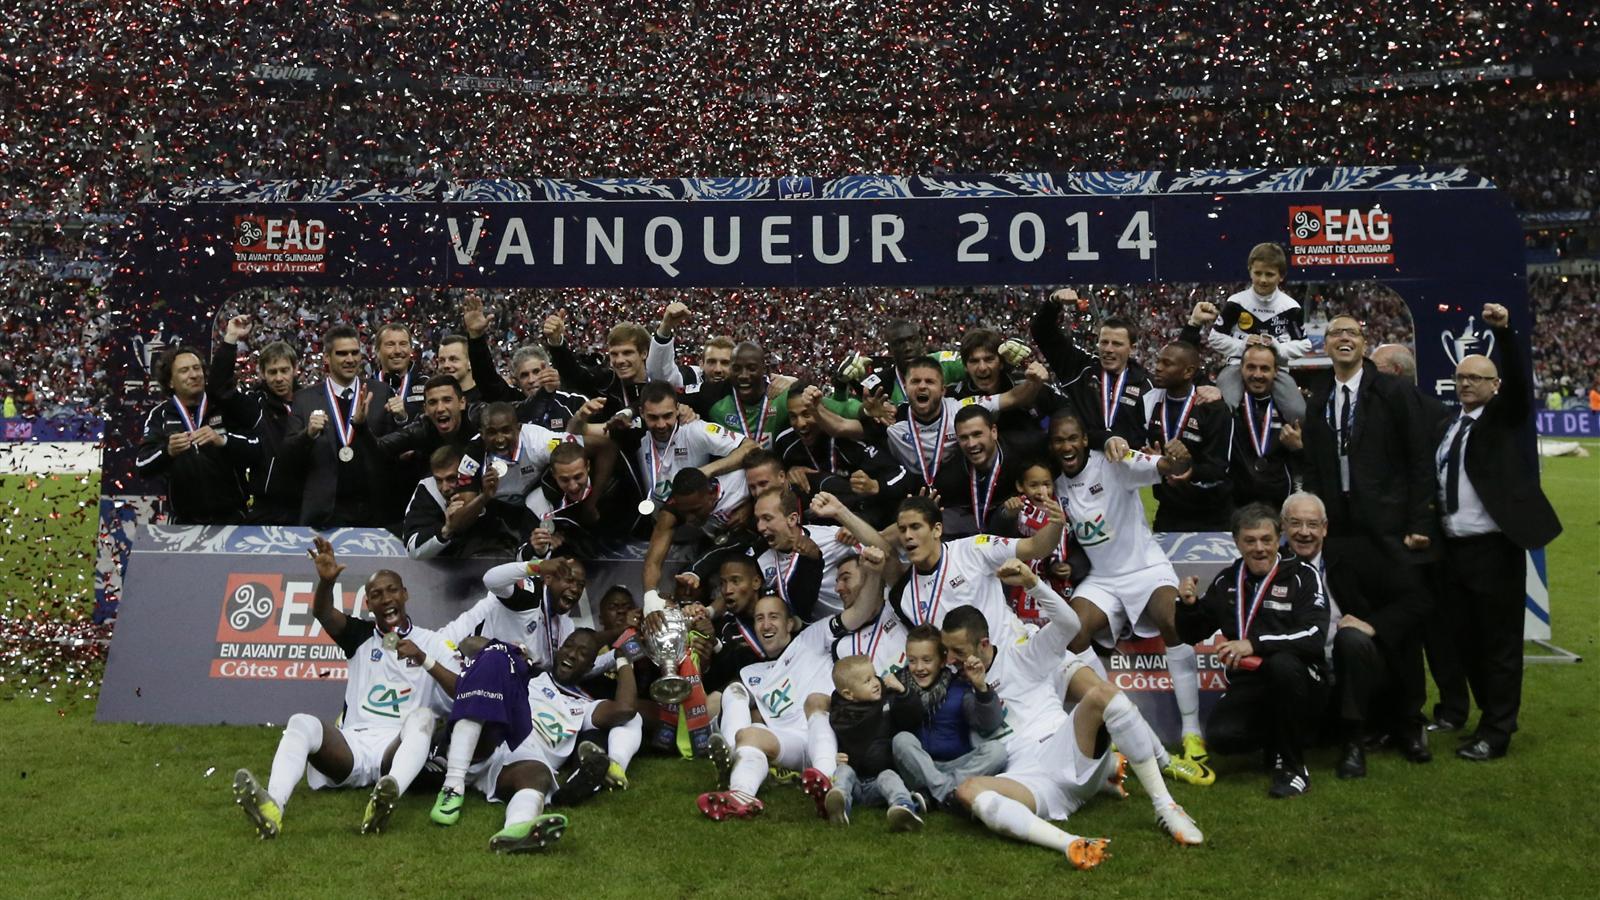 Ea guingamp club de ligue 2 football - Guingamp coupe de france ...